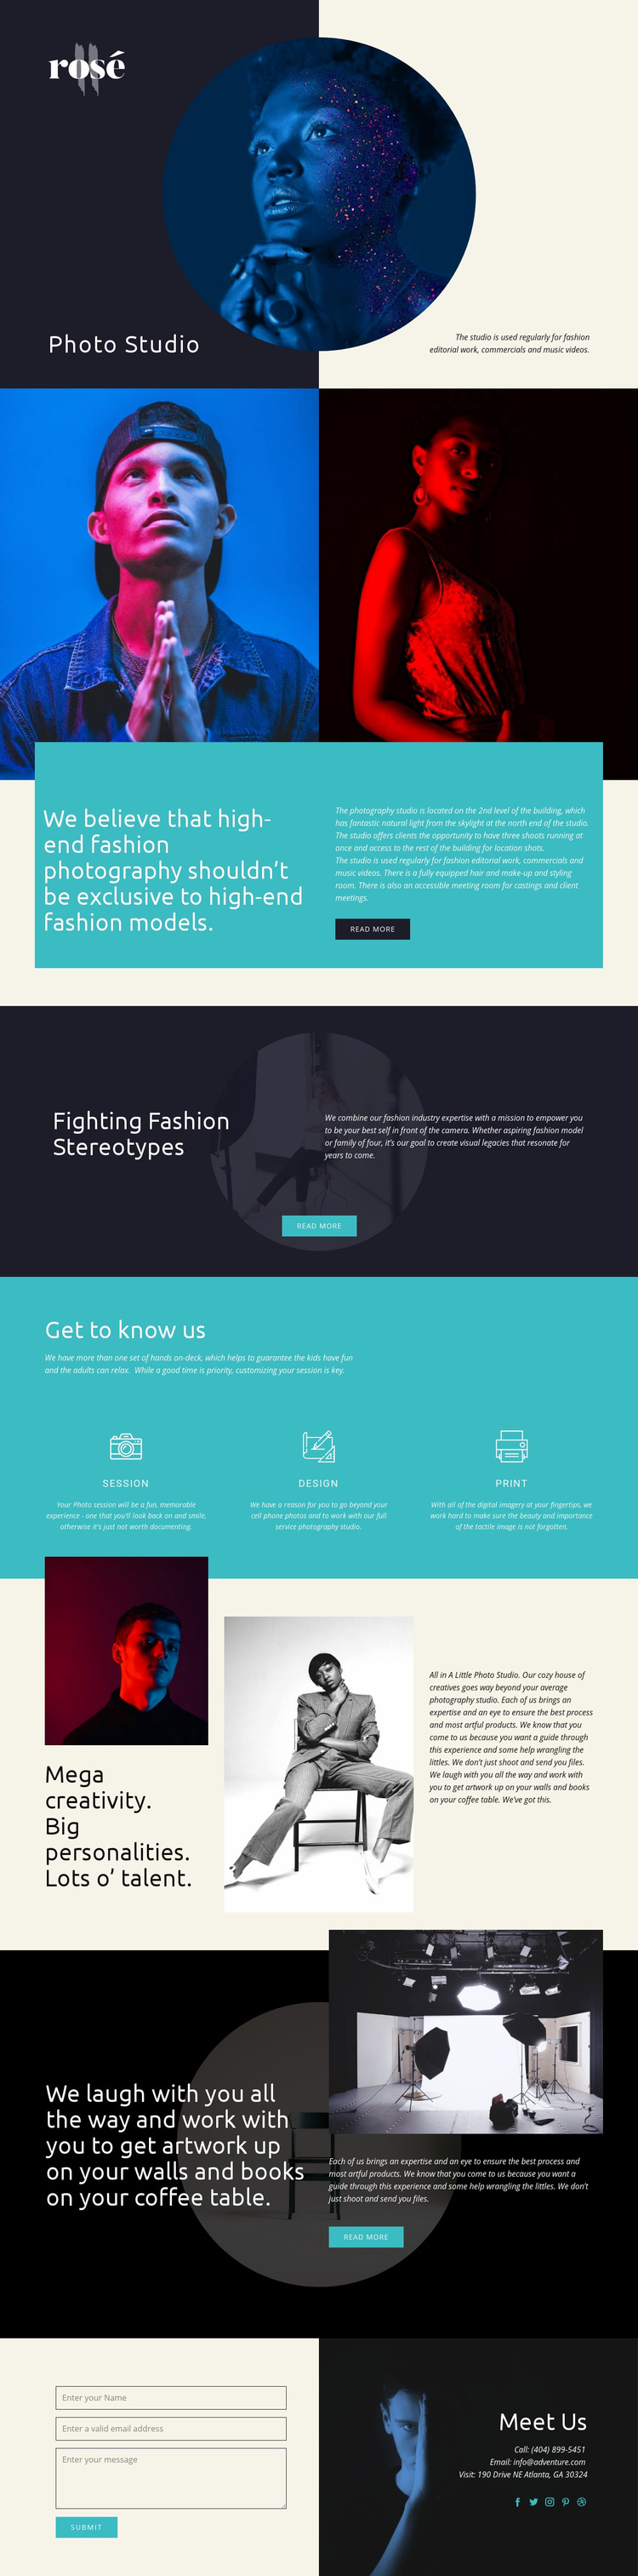 Rose Web Page Design